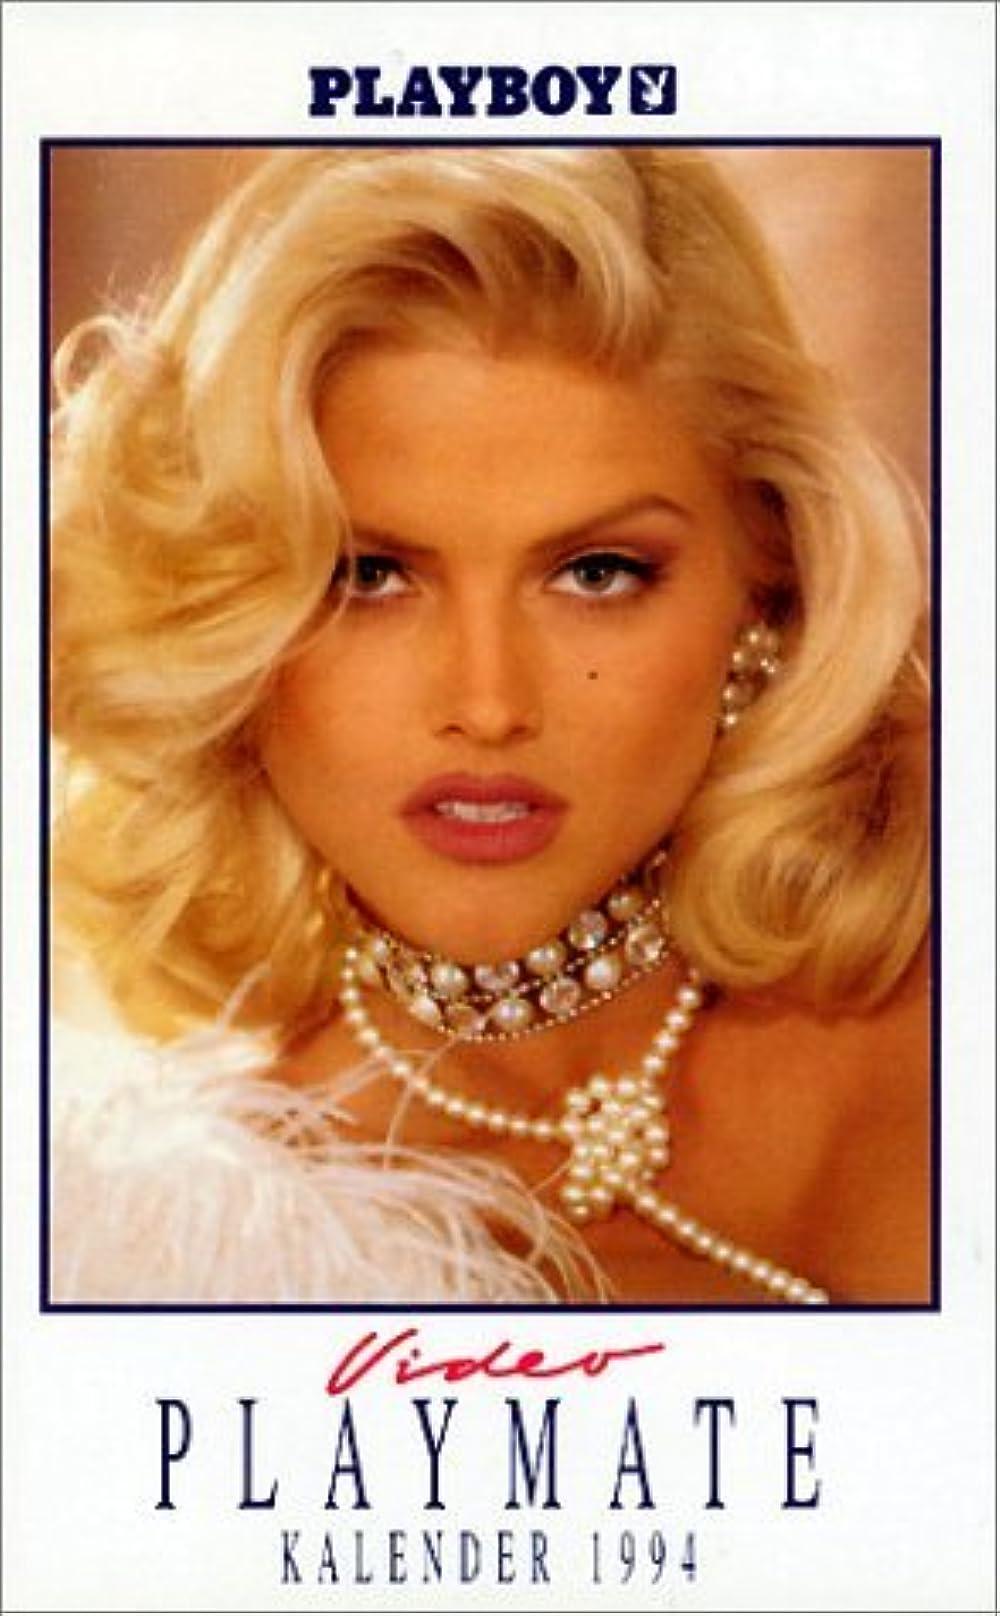 Playboy Video Playmate Calendar 1994 (1993)